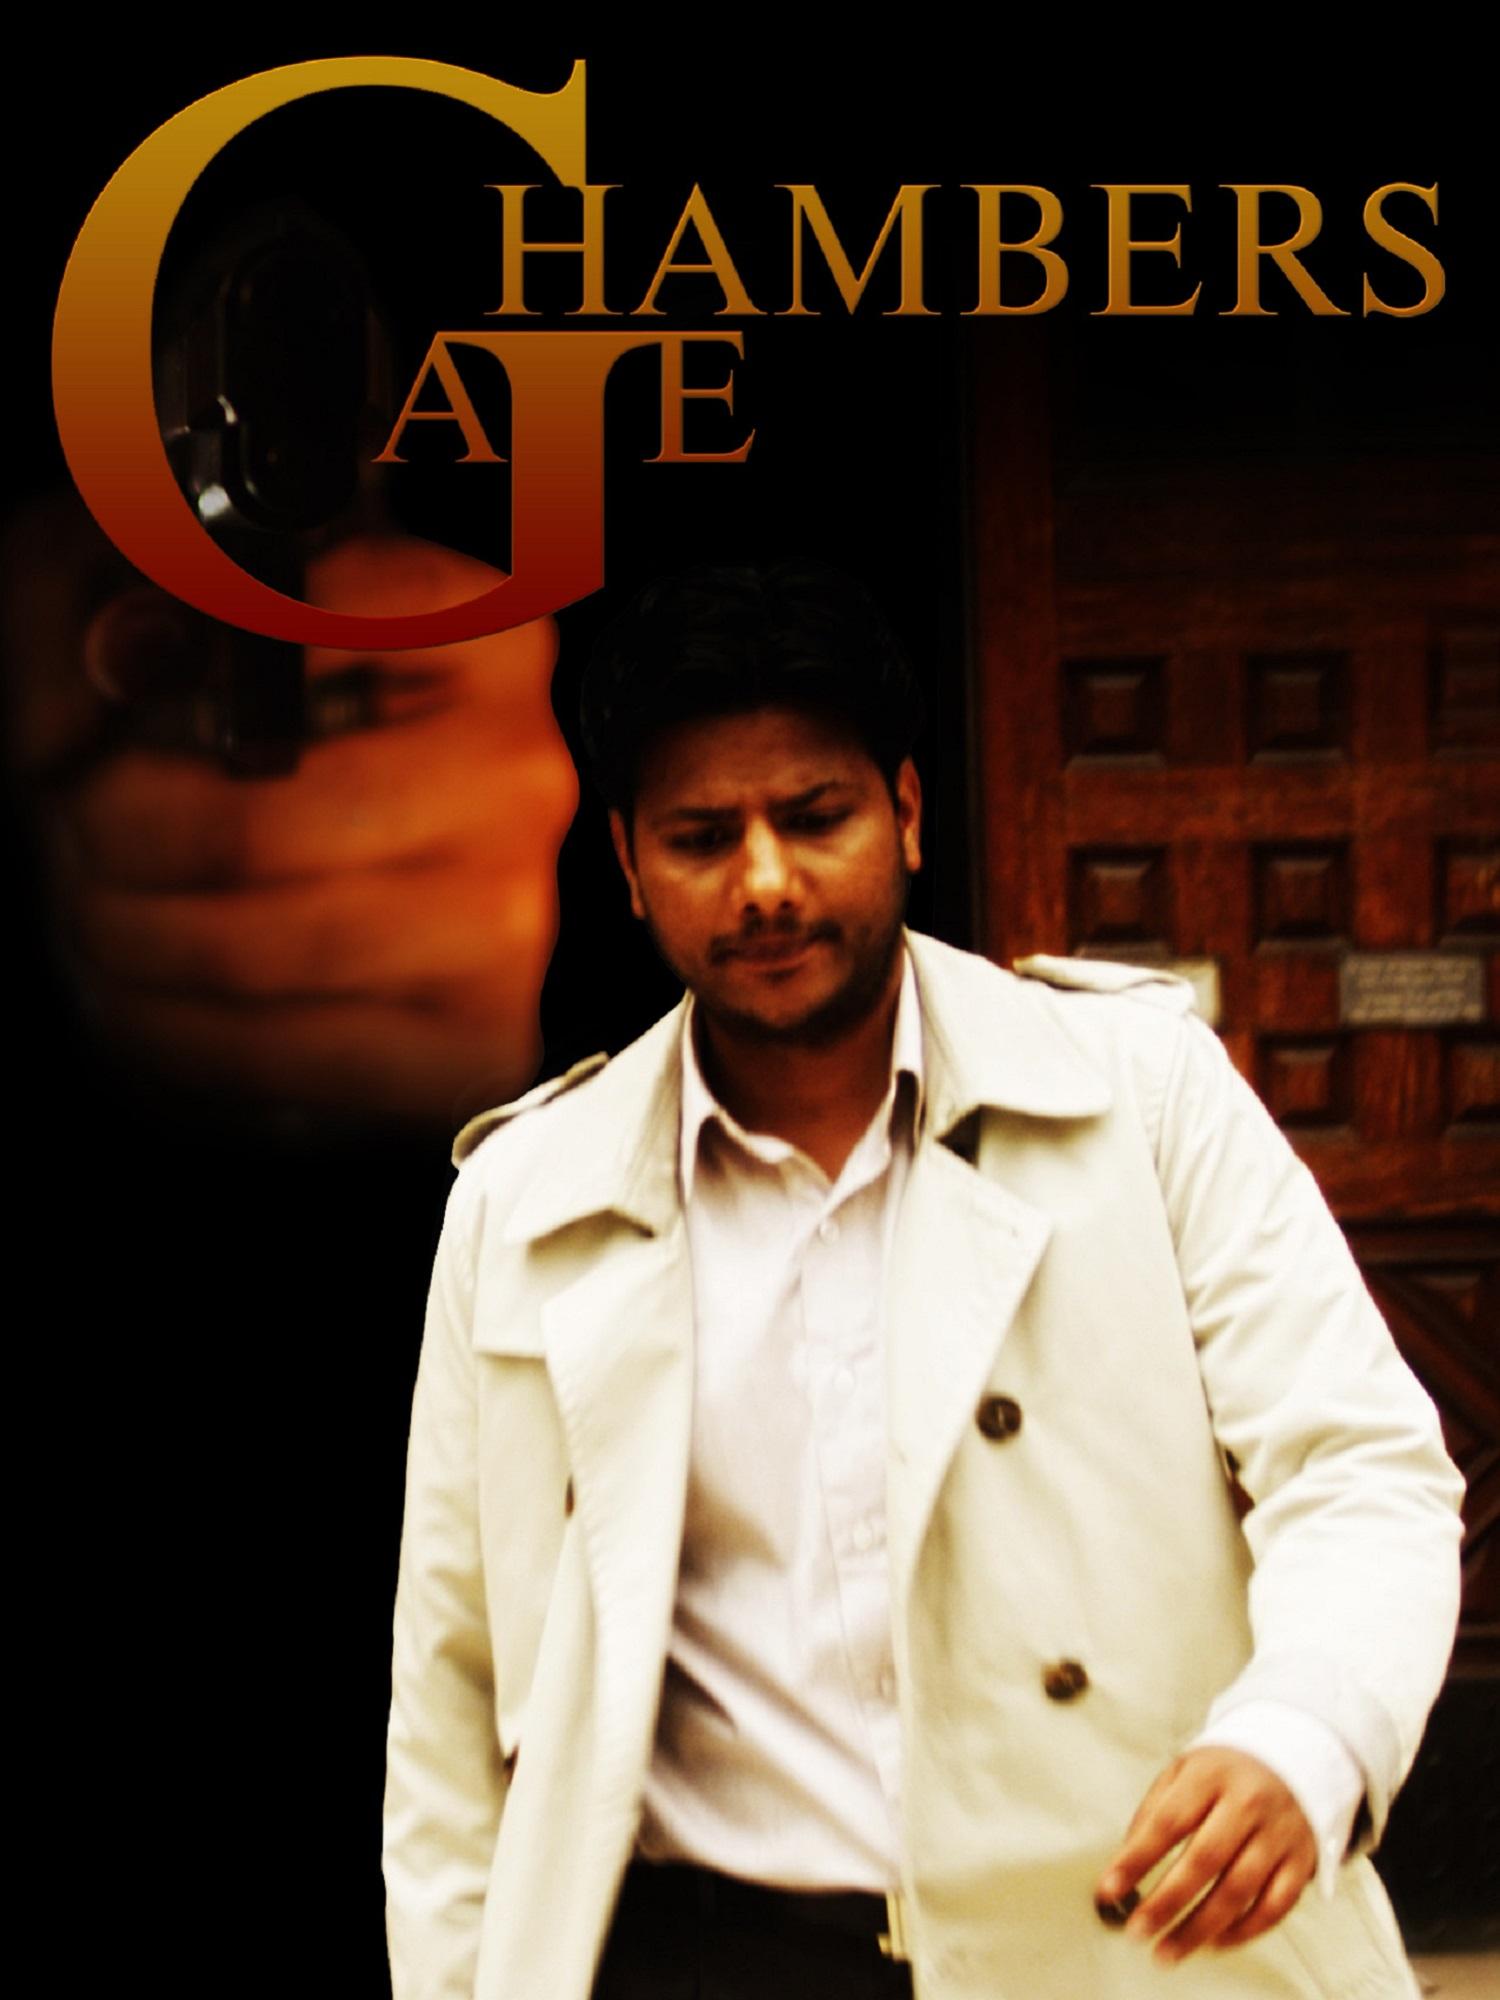 Chambers Gate (2014)